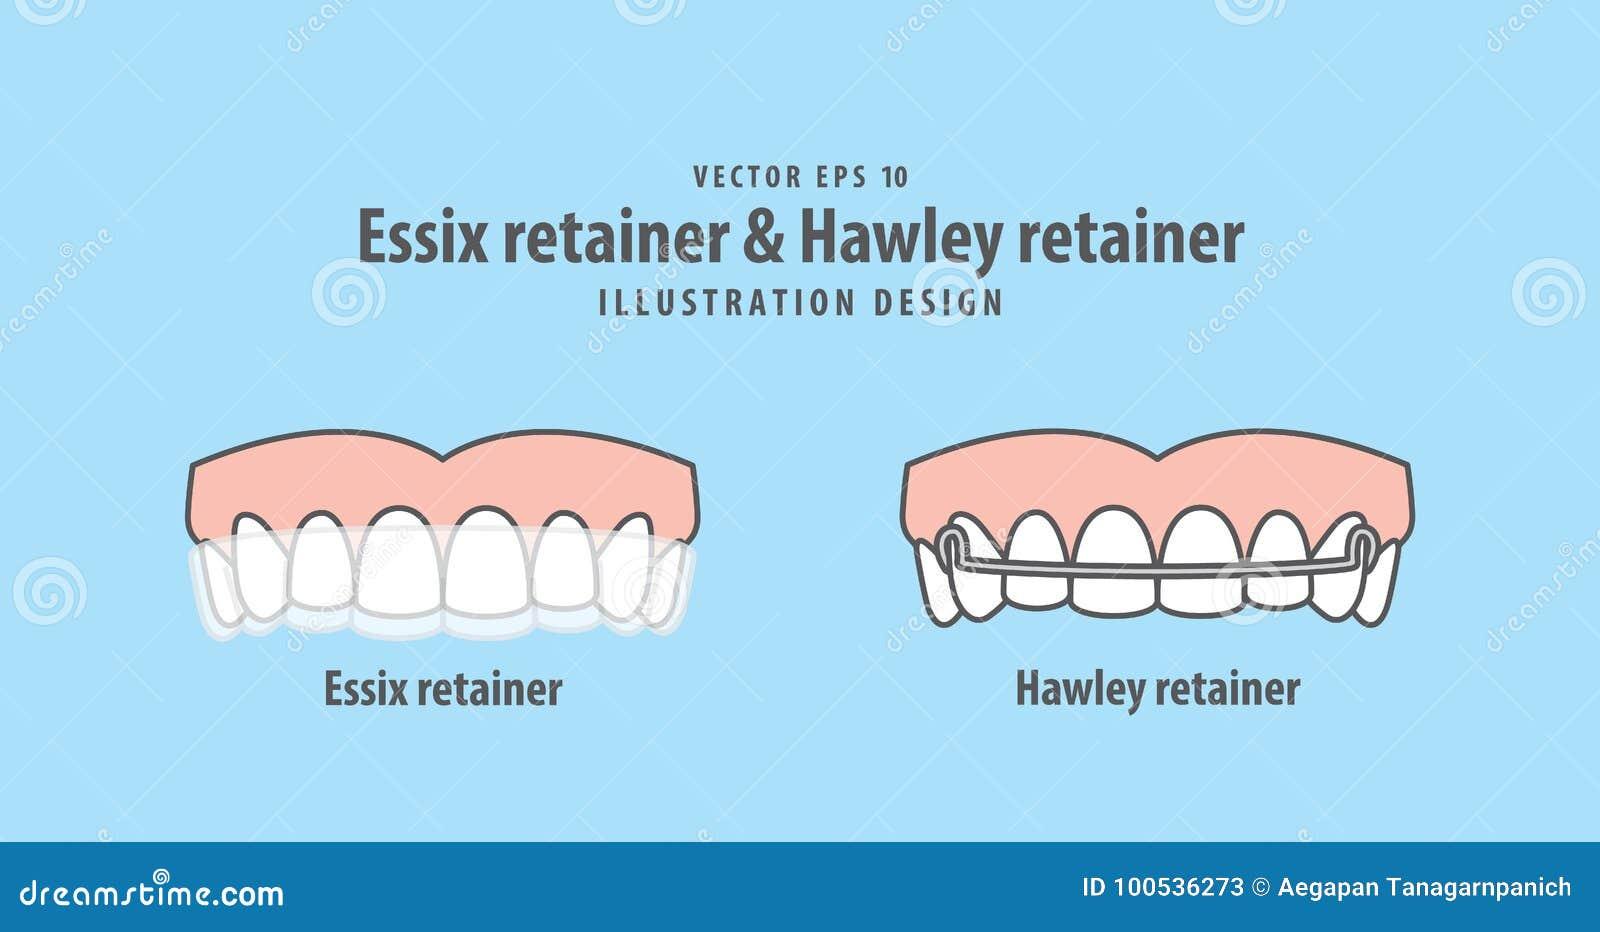 Essix Retainer & Hawley Retainer Illustration Vector On Blue